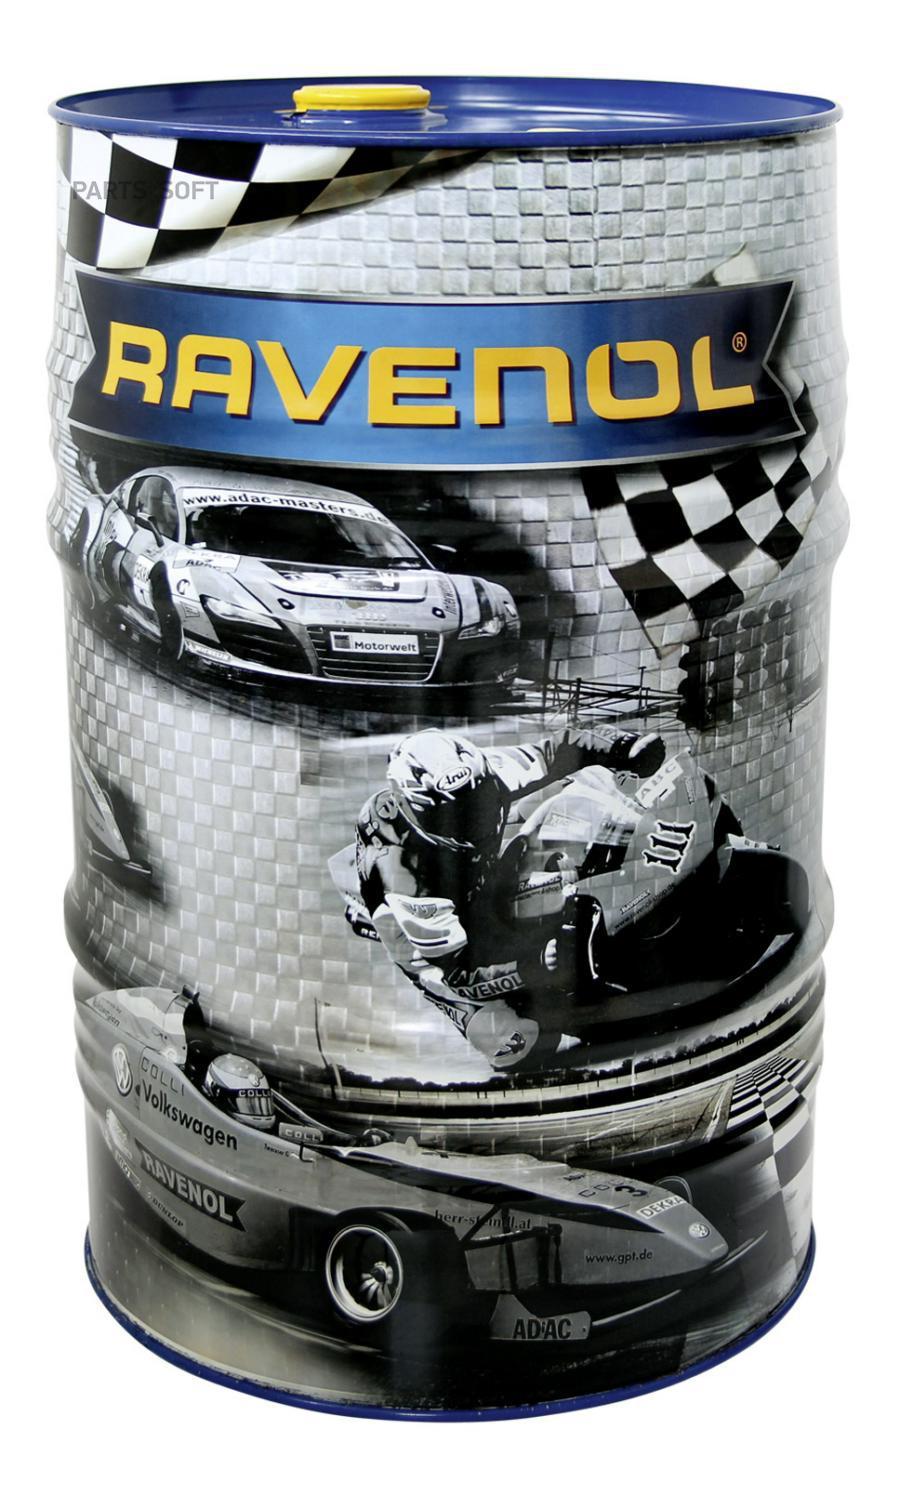 Ravenol TSI SAE 10W-40 .